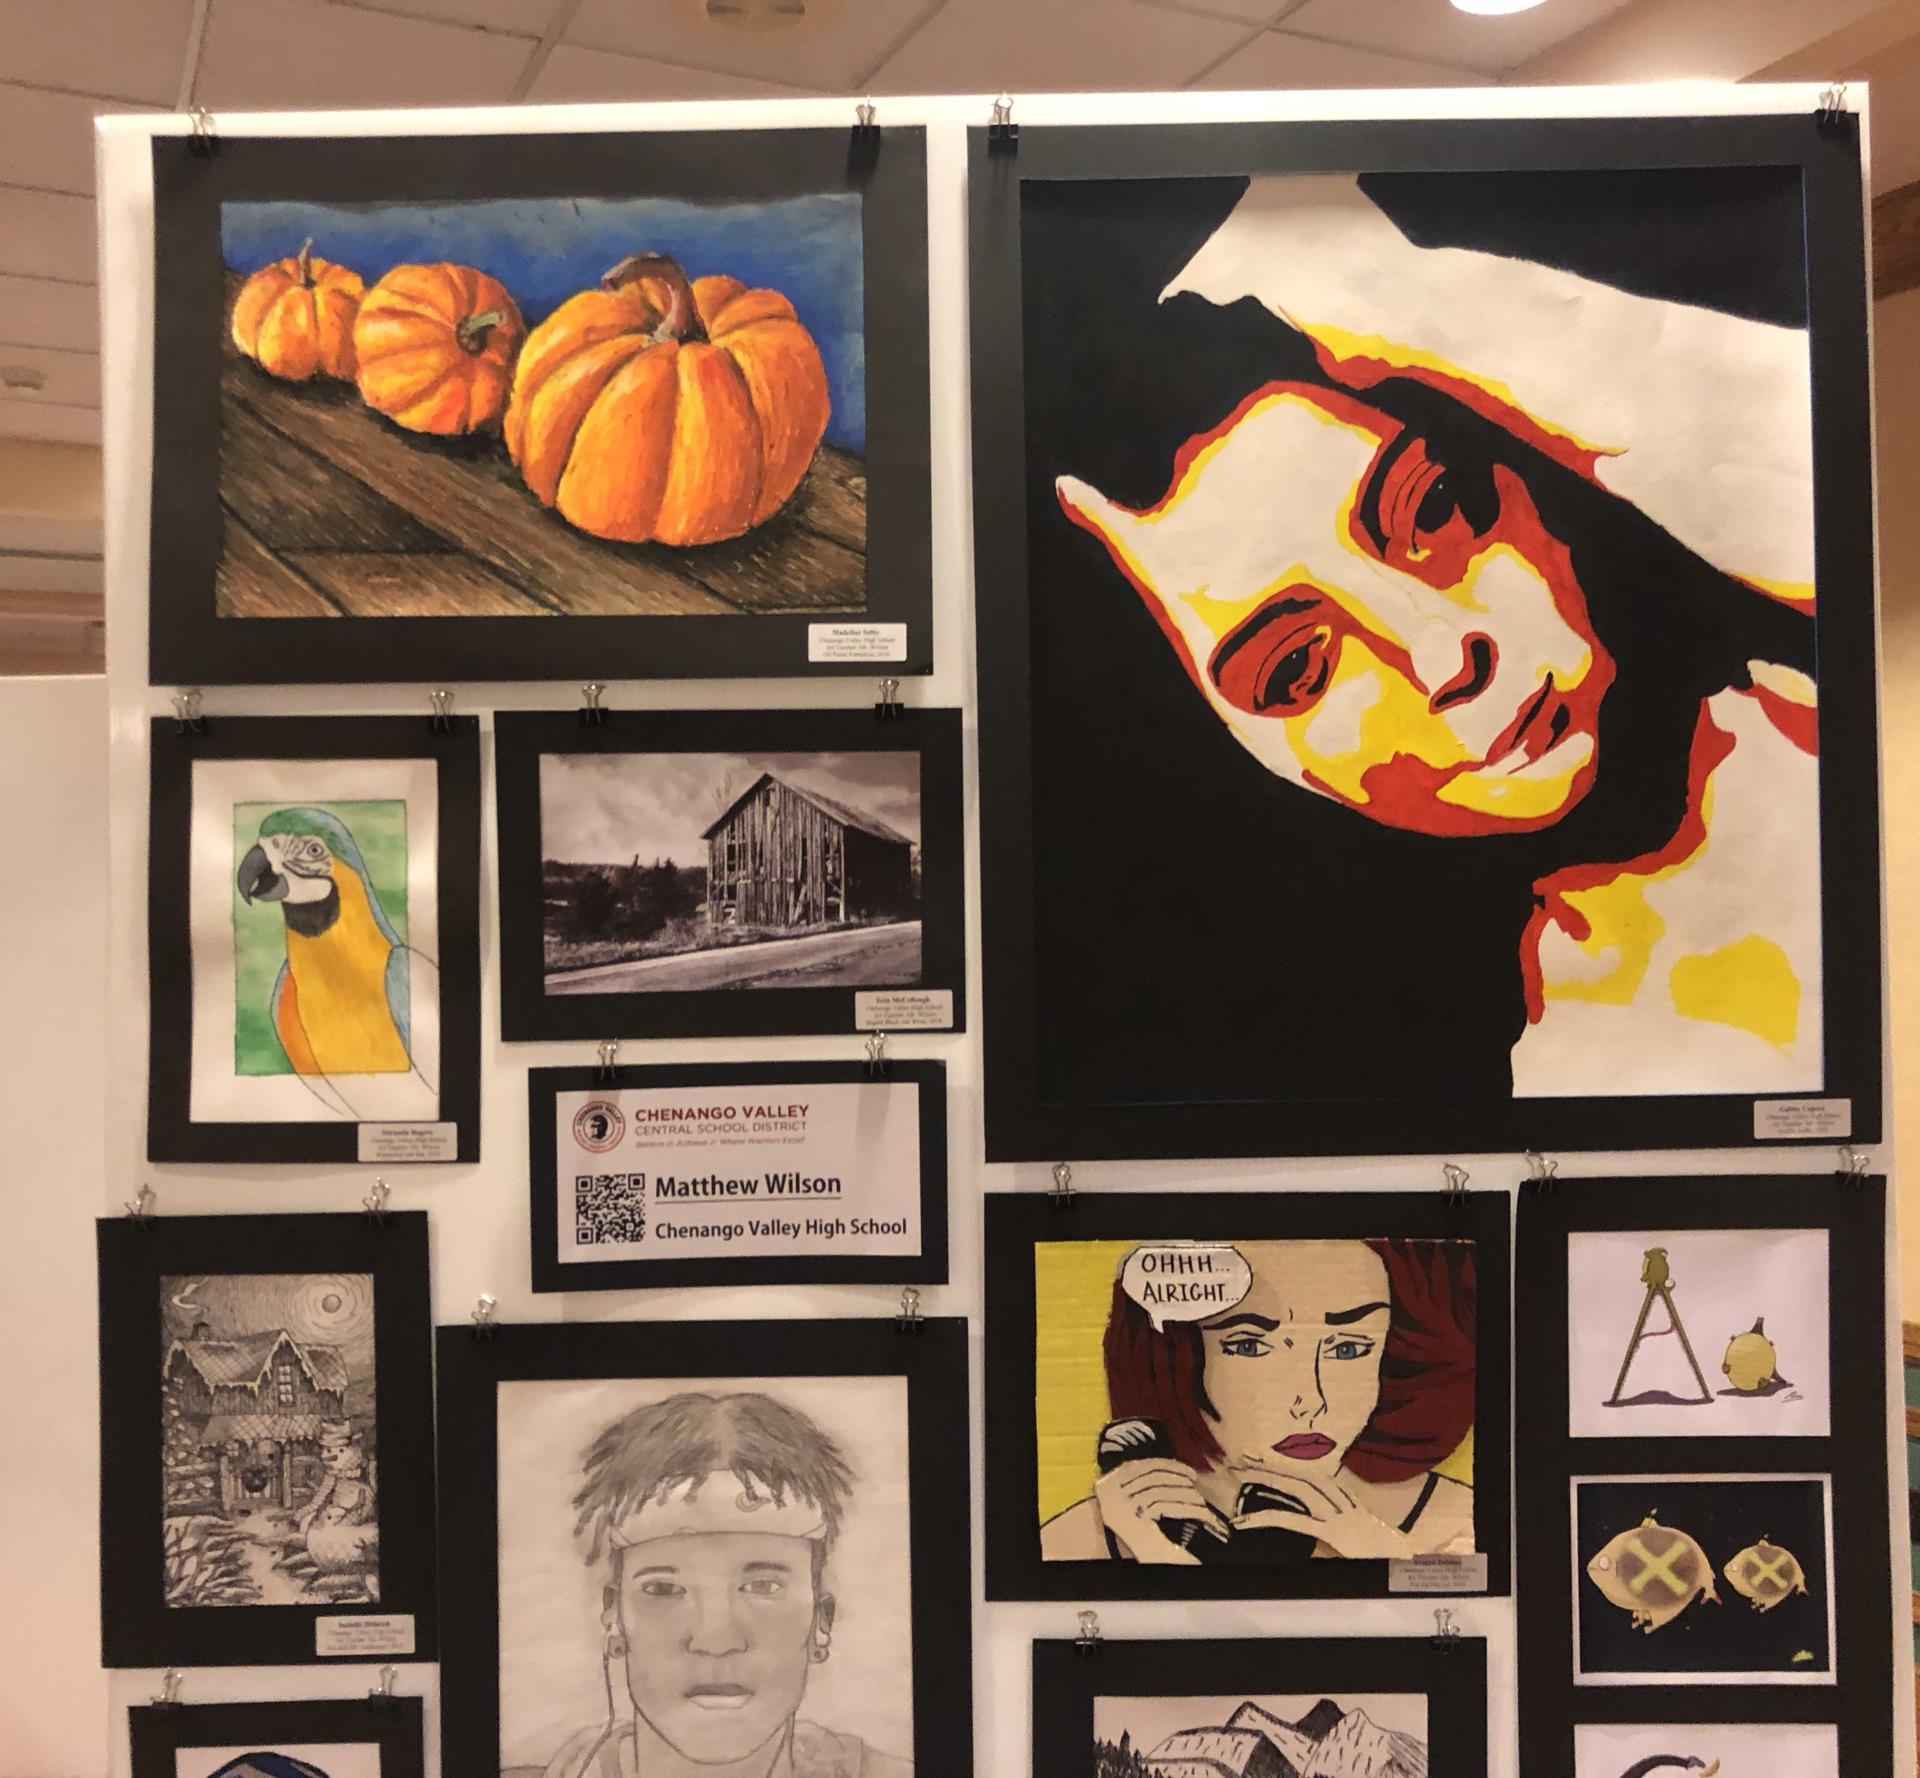 close up of top half of art work